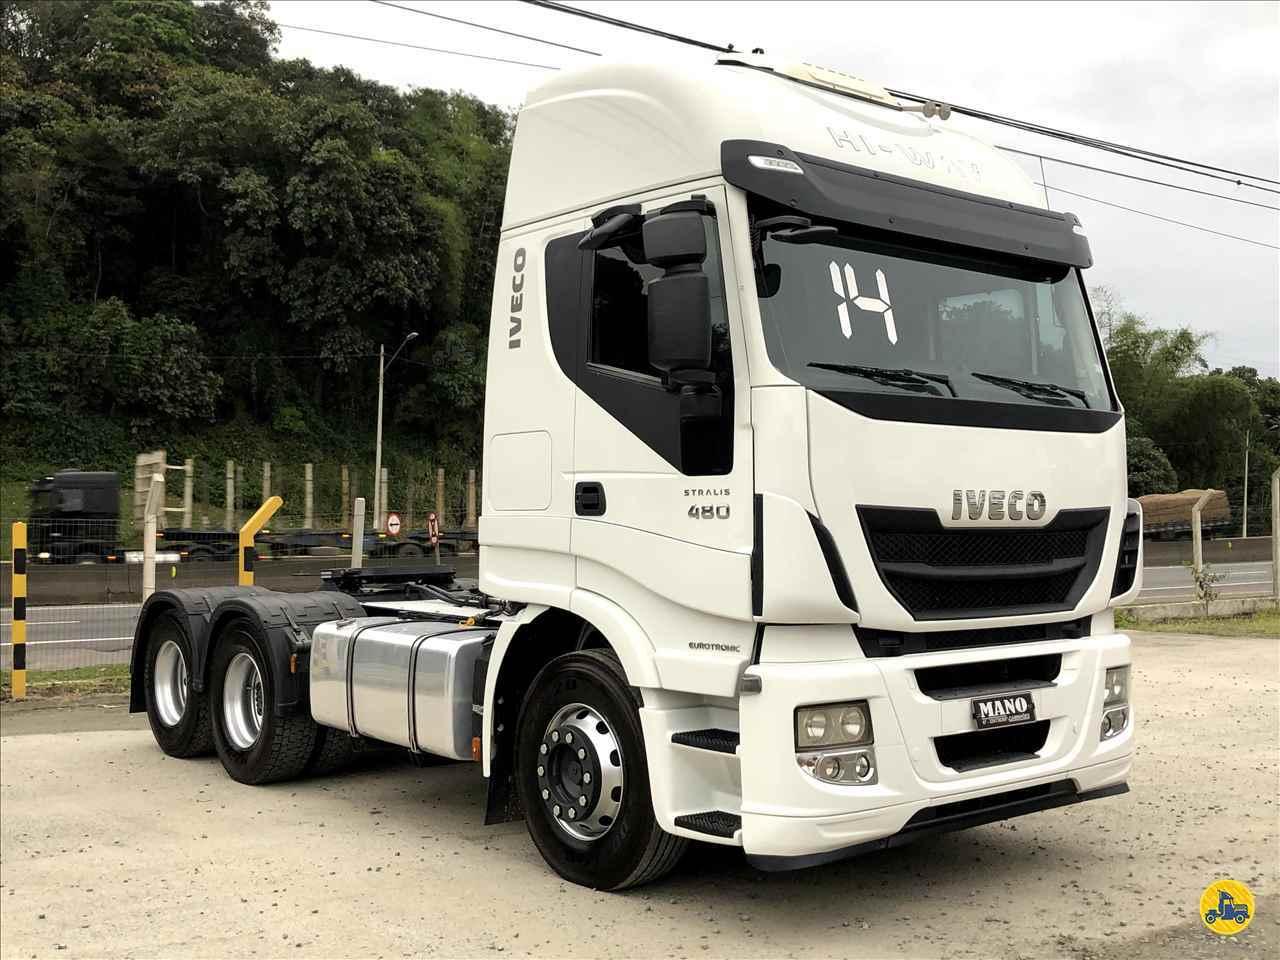 CAMINHAO IVECO STRALIS 480 Cavalo Mecânico Truck 6x2 Mano Caminhões JOINVILLE SANTA CATARINA SC